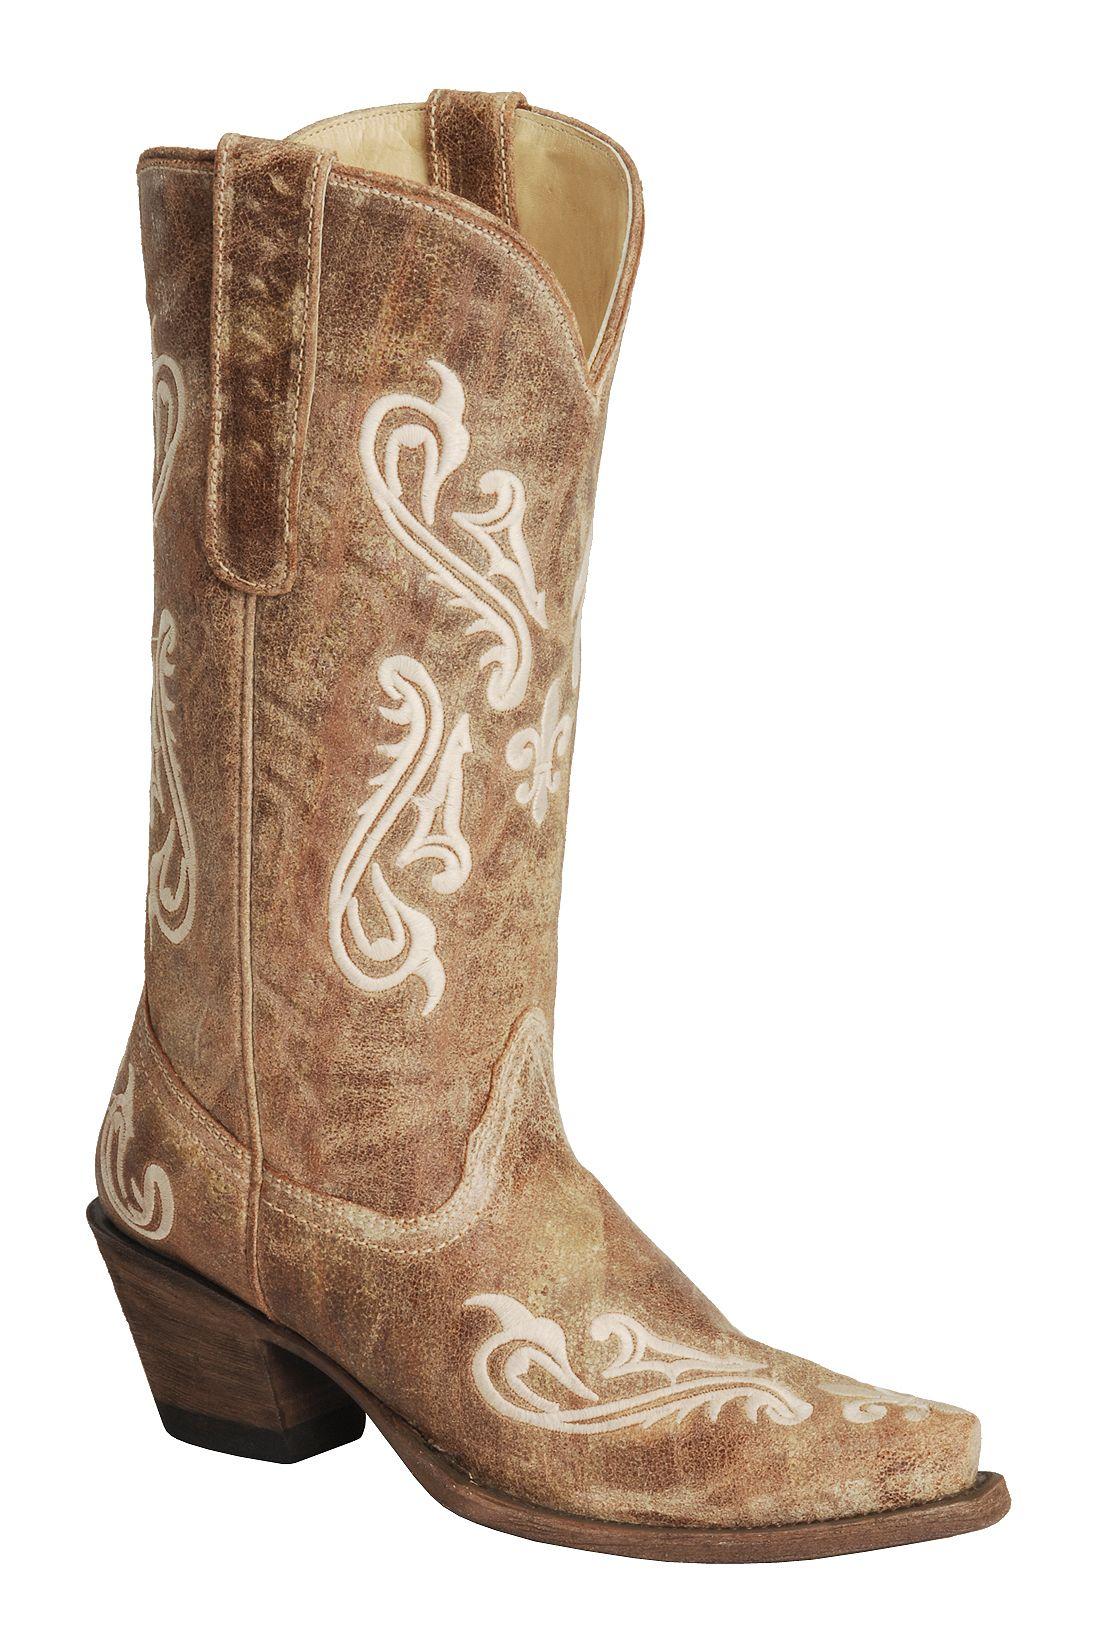 Corral Cortez Distressed Fleur De Lis Embroidered Cowgirl